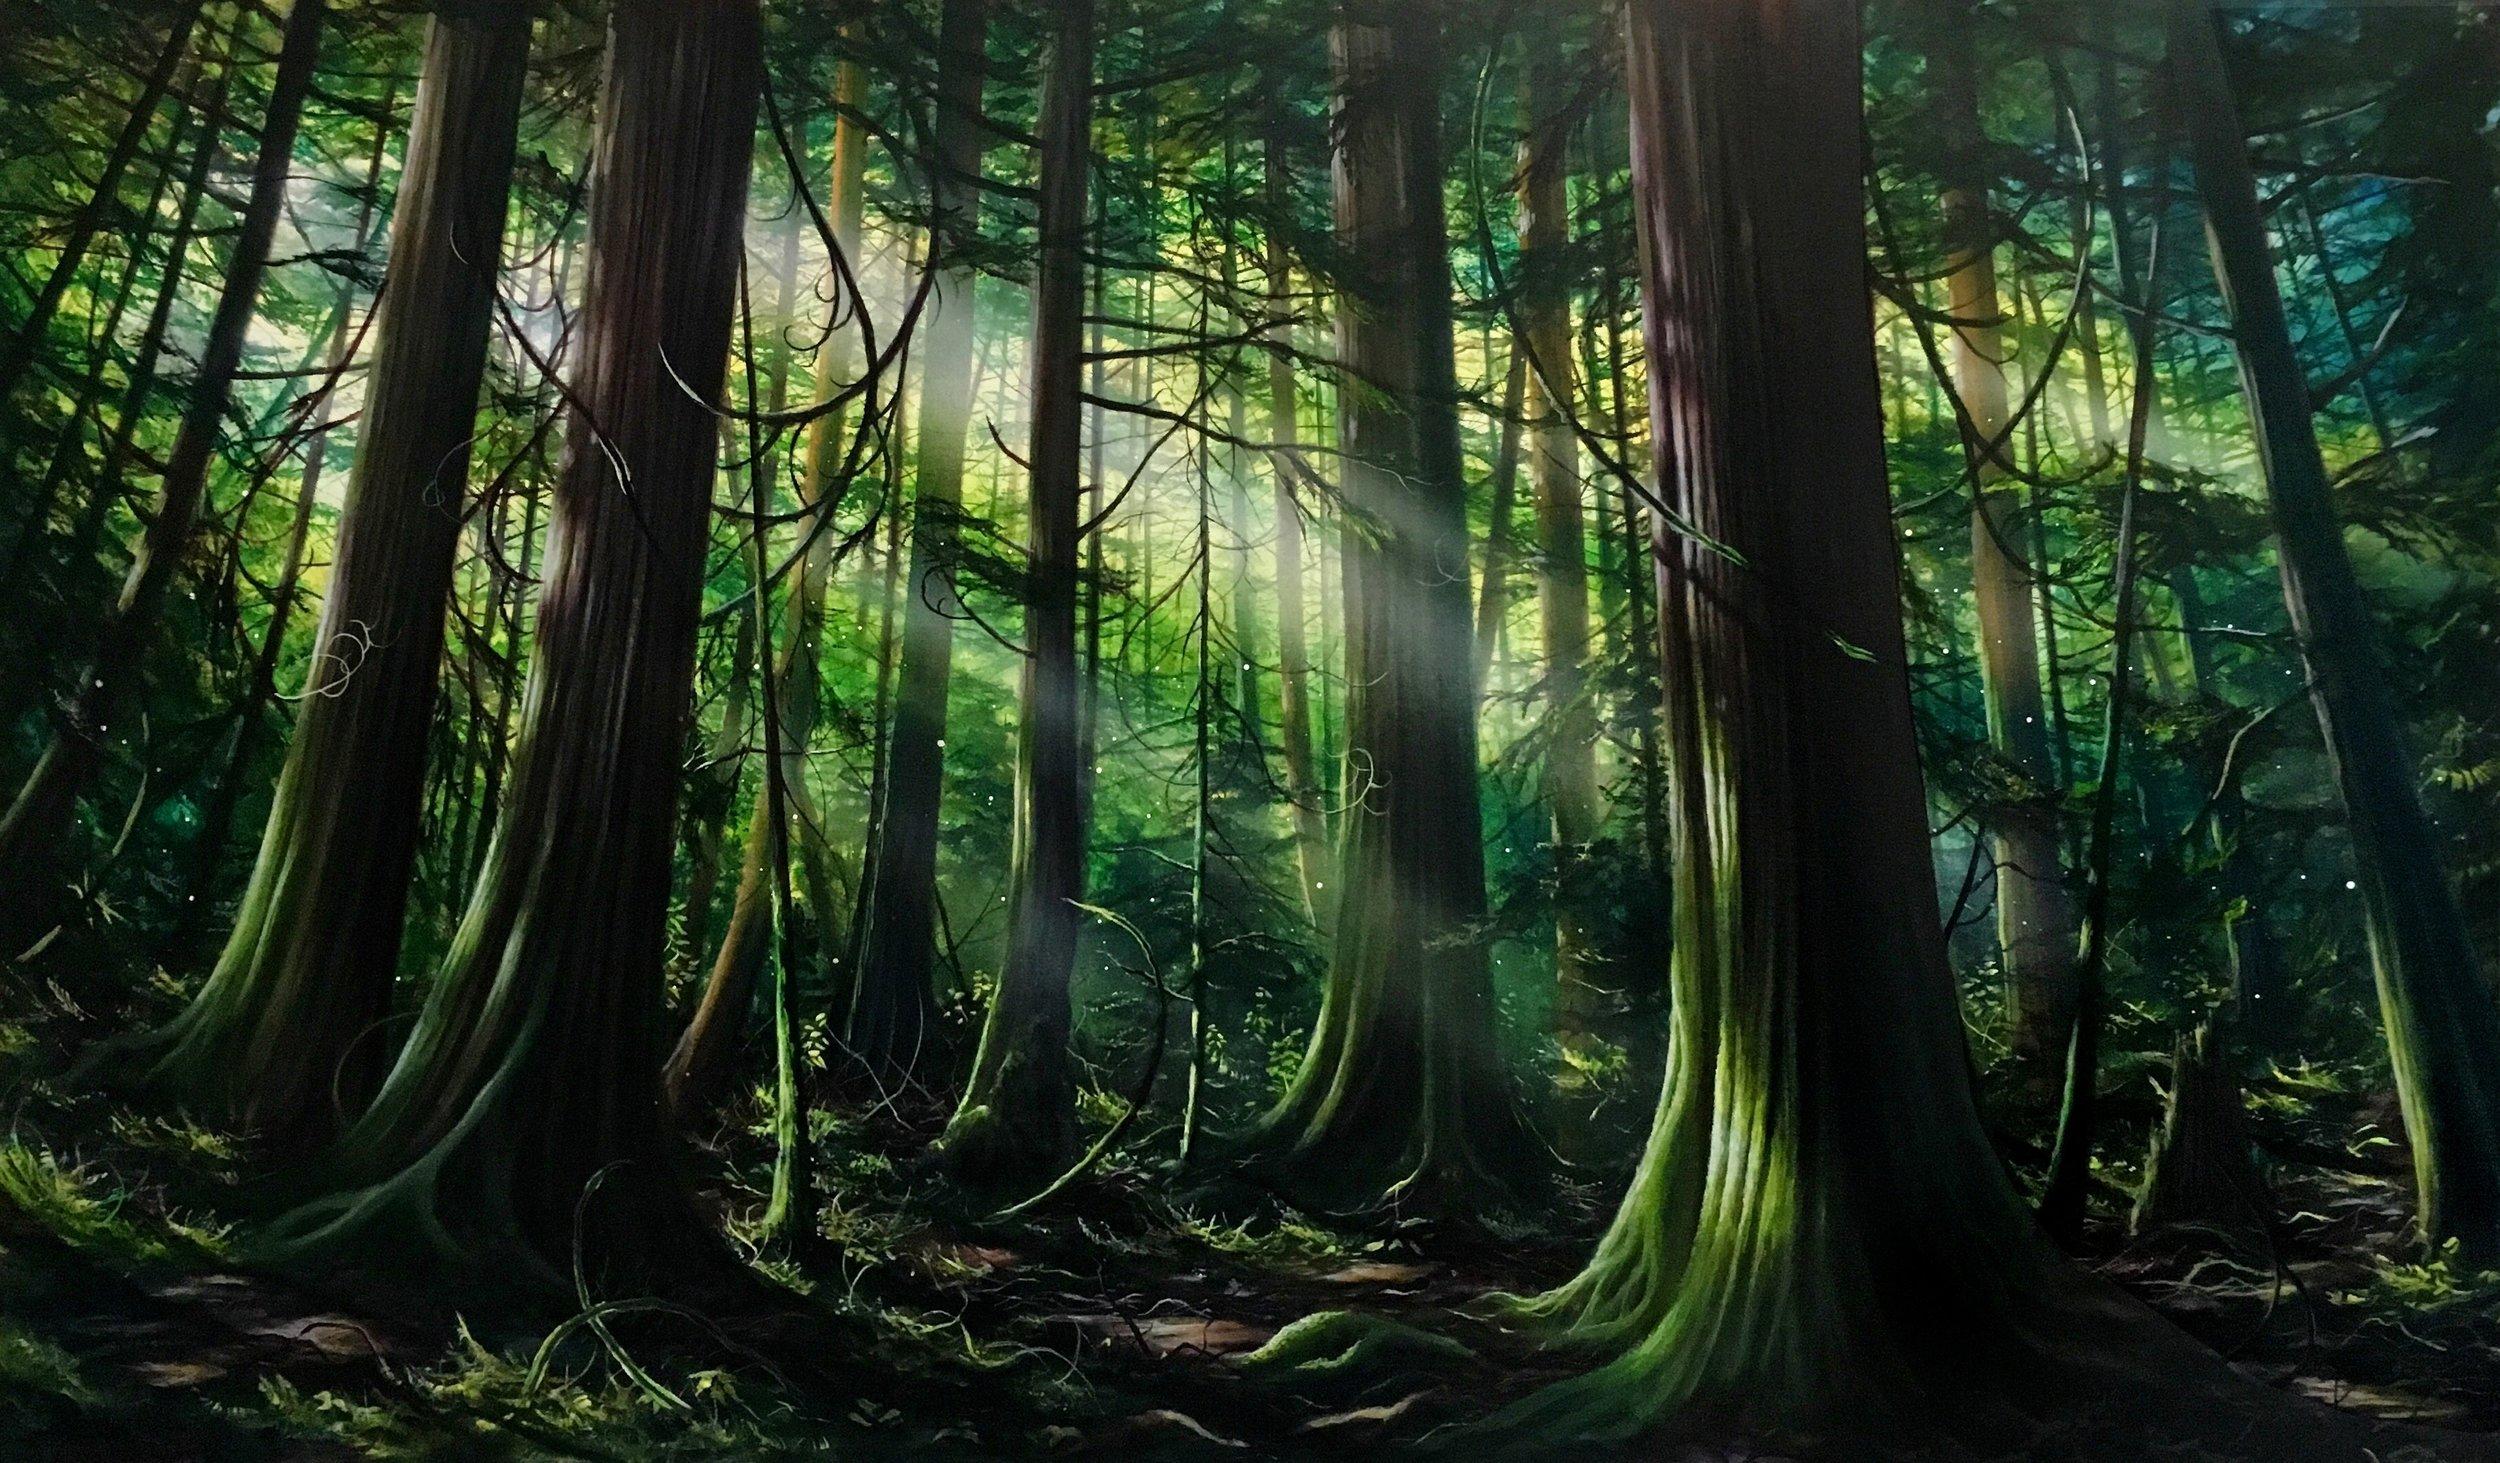 RAINFORESTS & MYTHOLOGY - LOGAN FORD & LIZ DEMPSEYOctober 18th - November 14th 2018